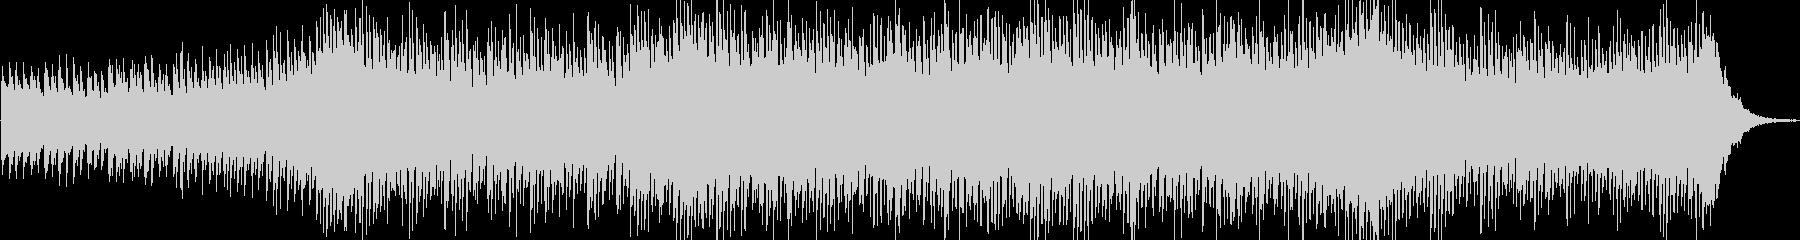 Orchestral- Pop-R...の未再生の波形